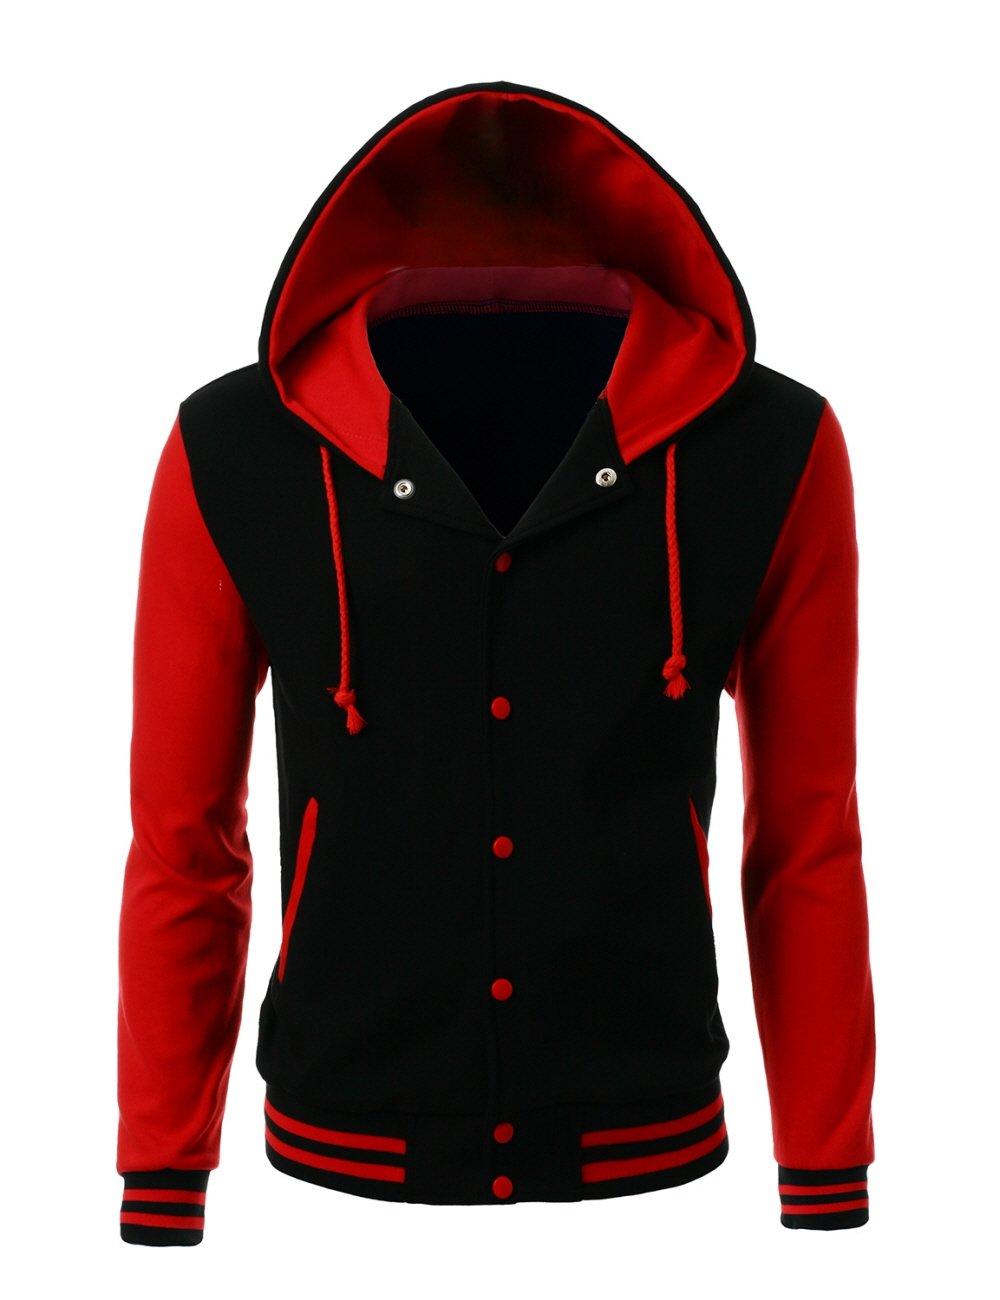 Stylish Color Contrast Long Sleeves Hoodie Varsity Jacket Black Red XL